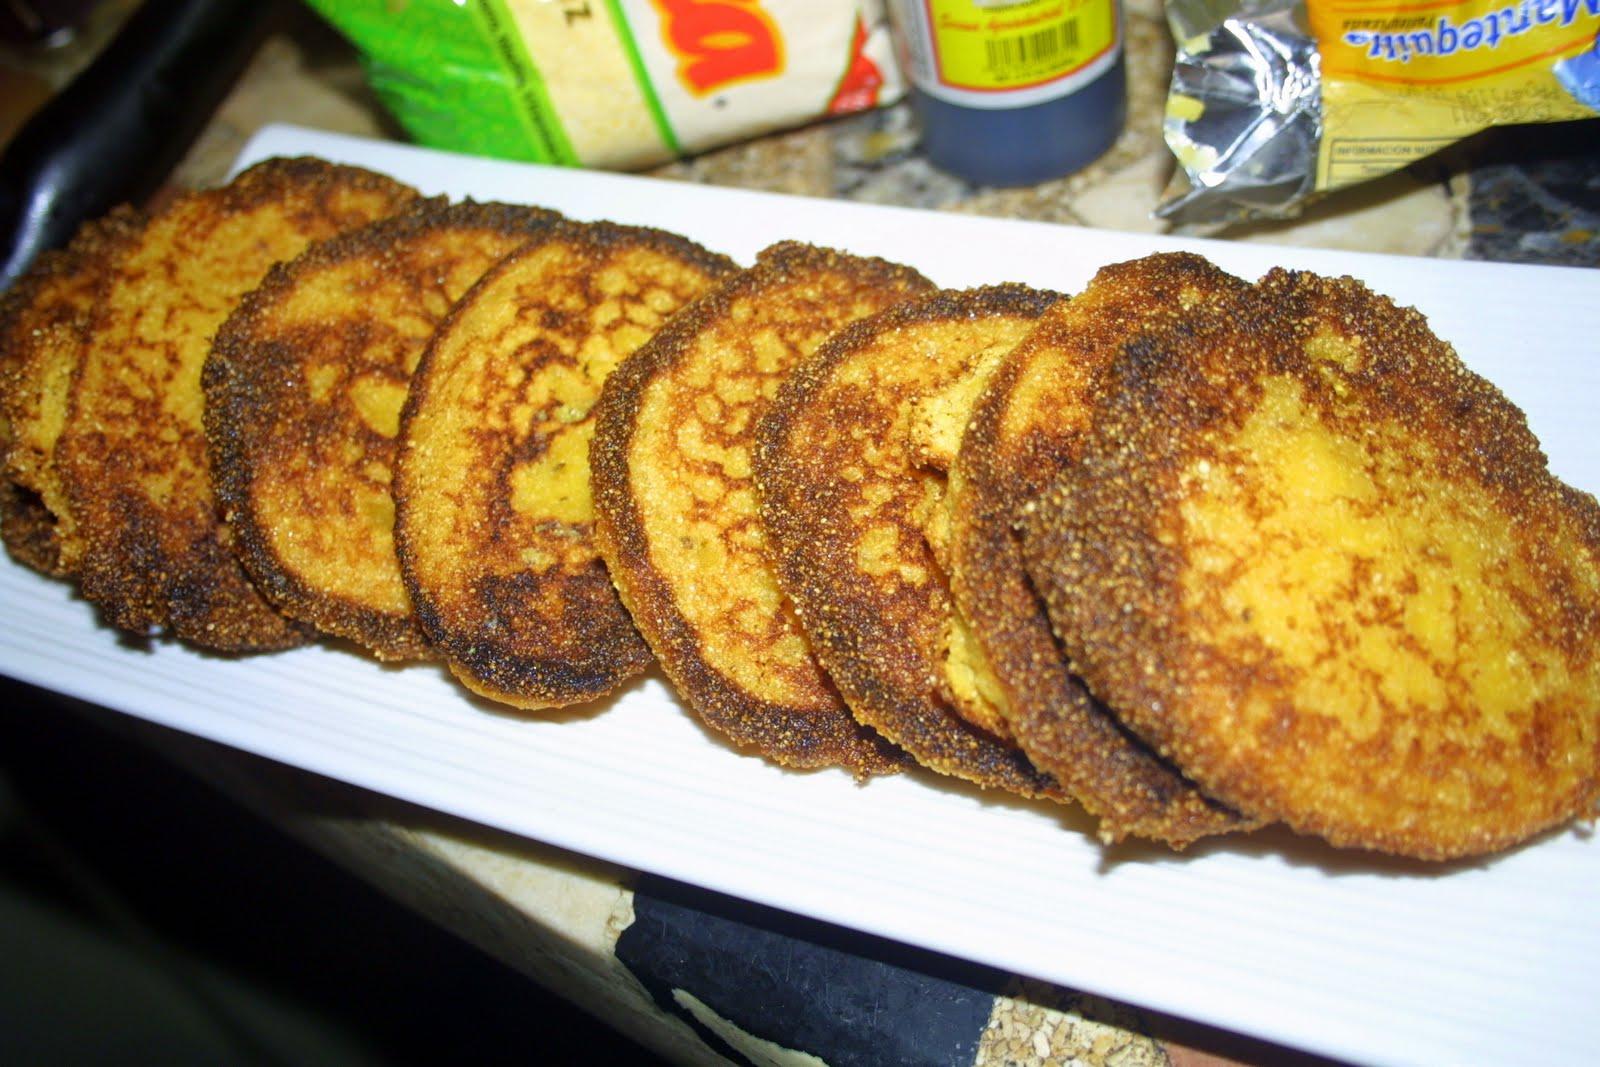 Mazorca Maiz Embarazo de Harina de Maiz Mazorca